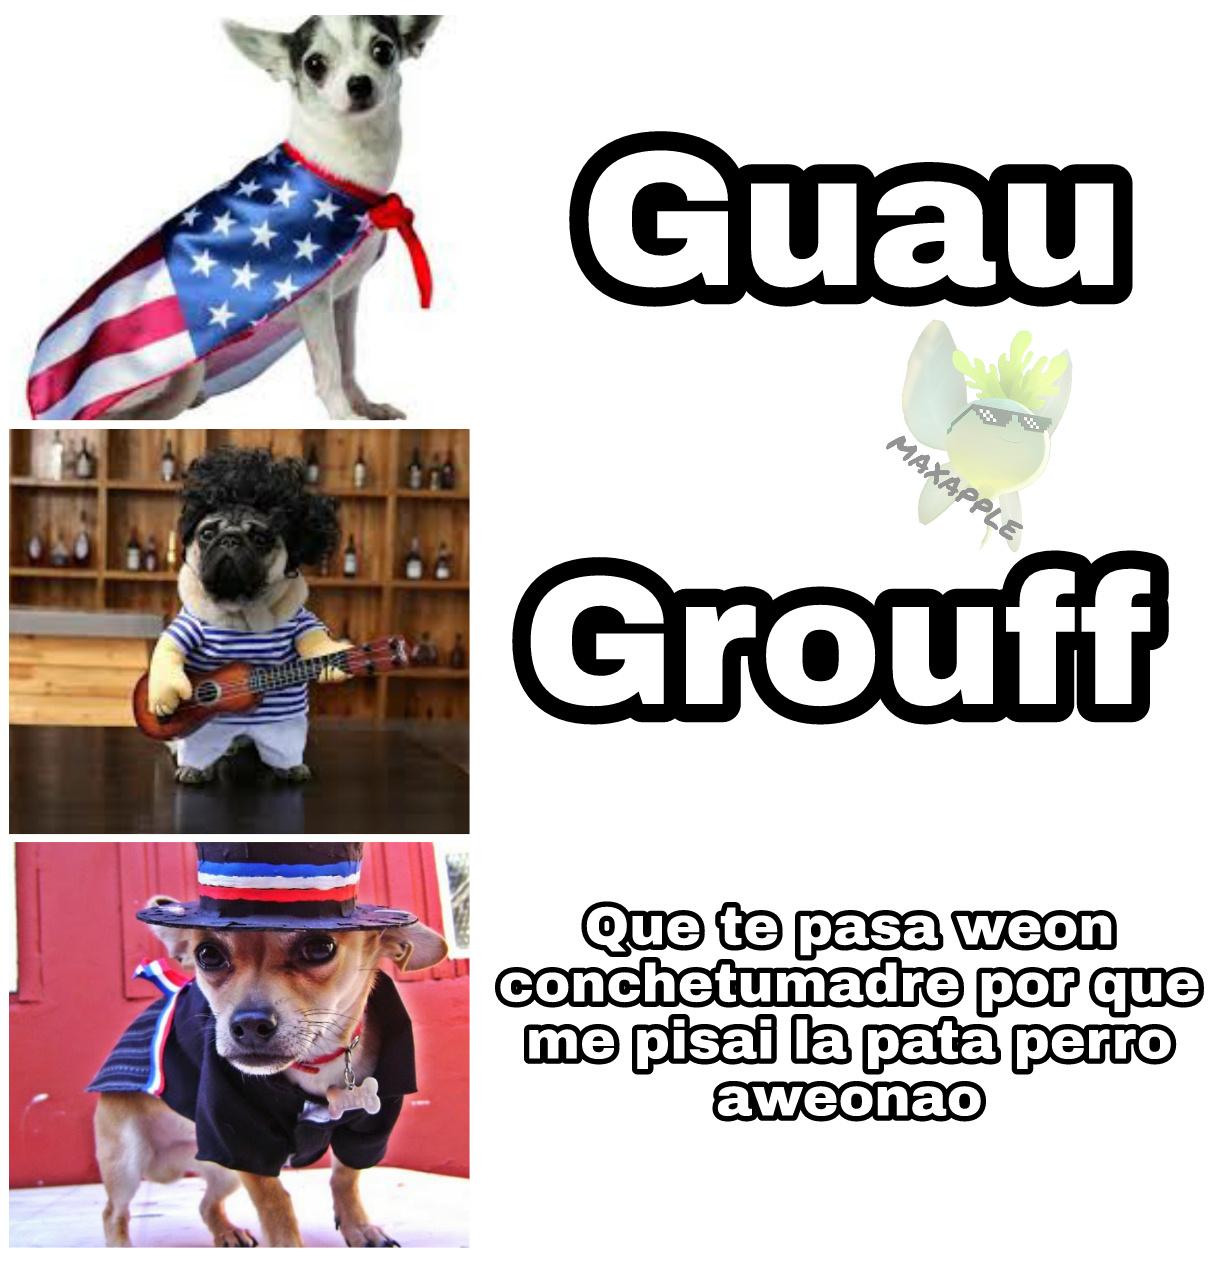 El perro weon. Idea Ferdrawins - meme